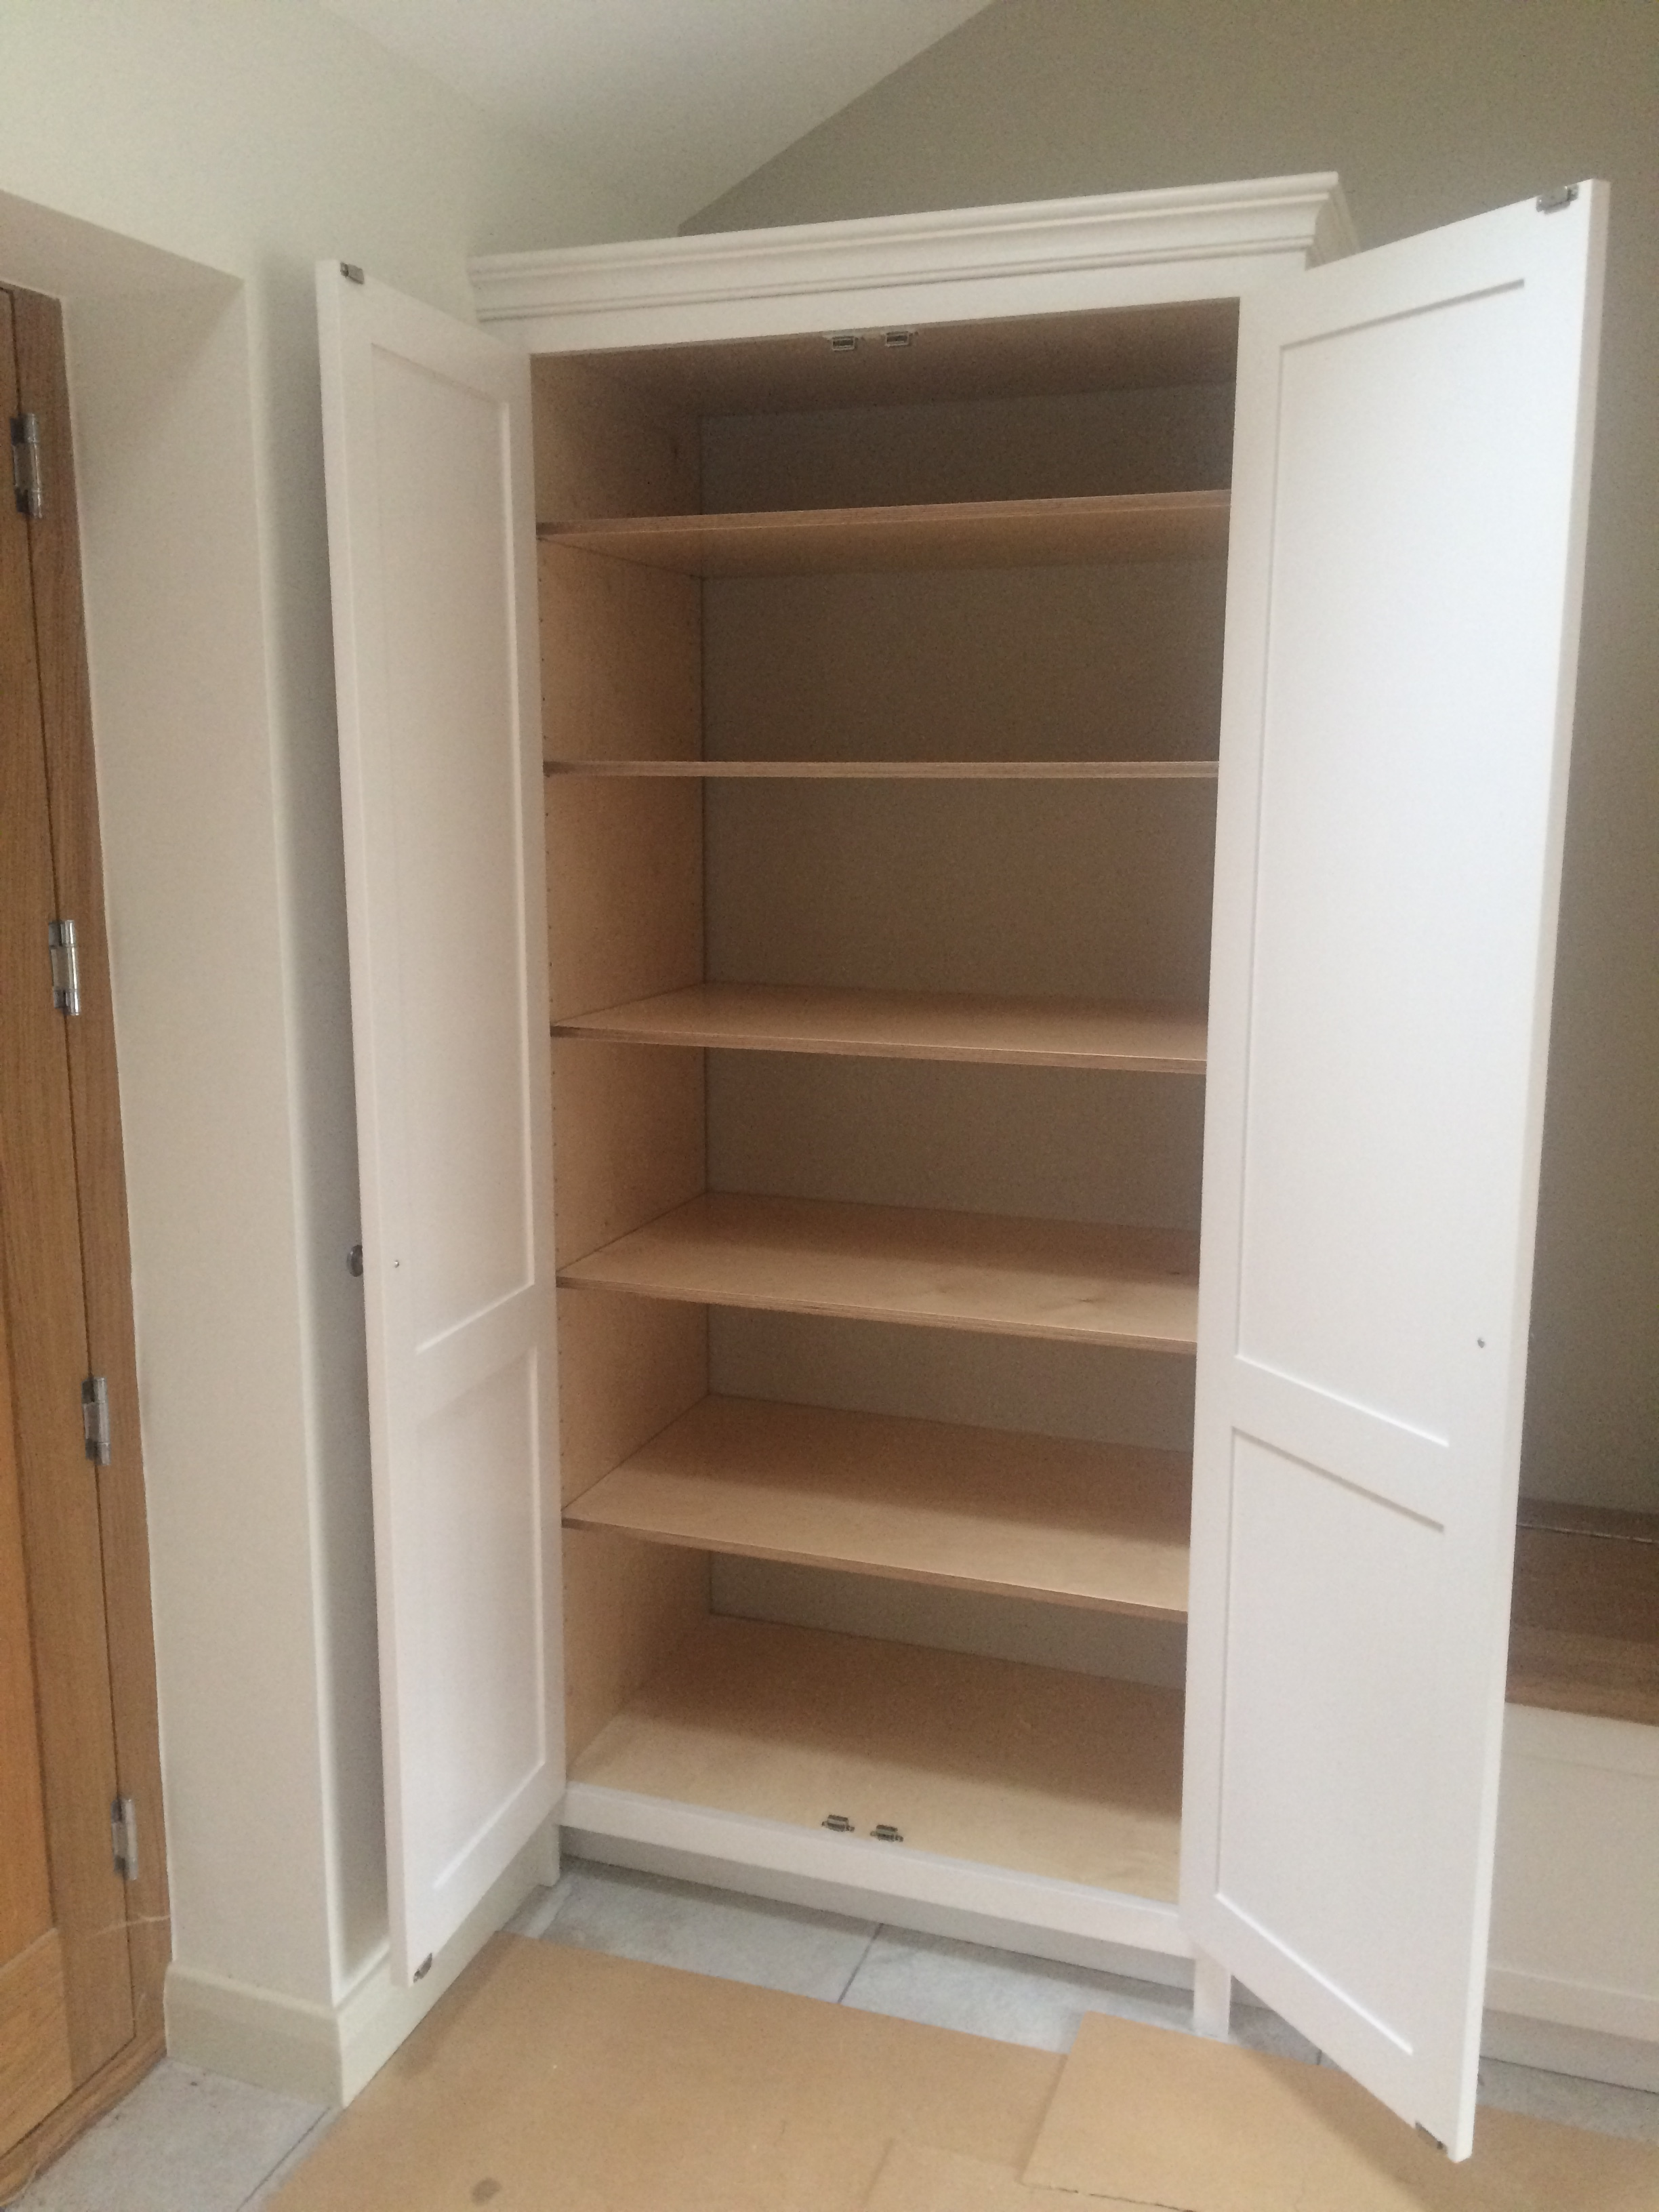 Cabinet woodwork